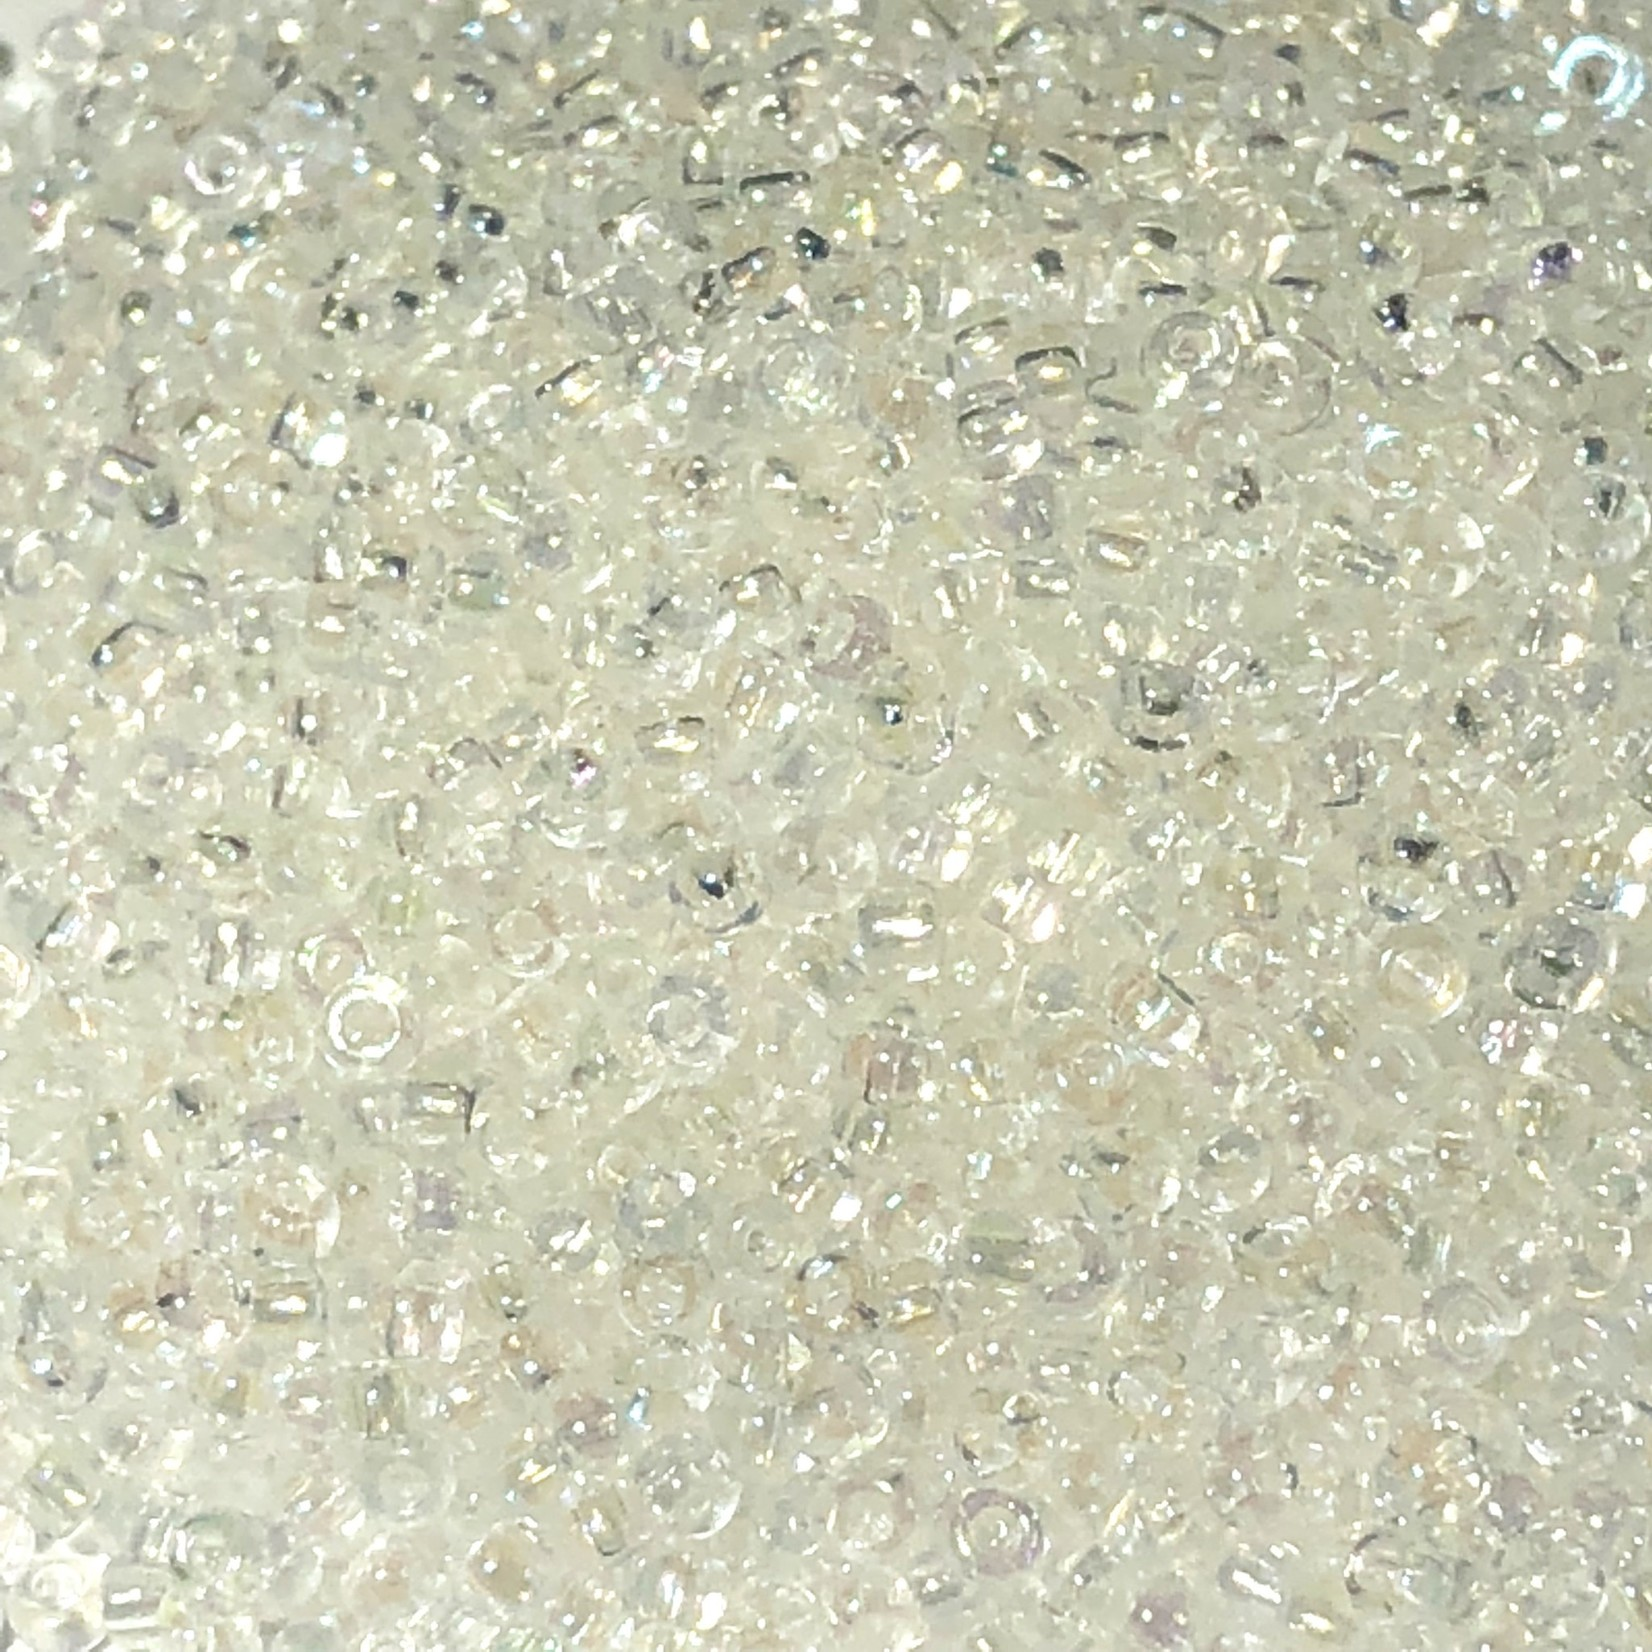 PRECIOSA 10-0 Seed Beads Transparent Iris Crystal 22.5g